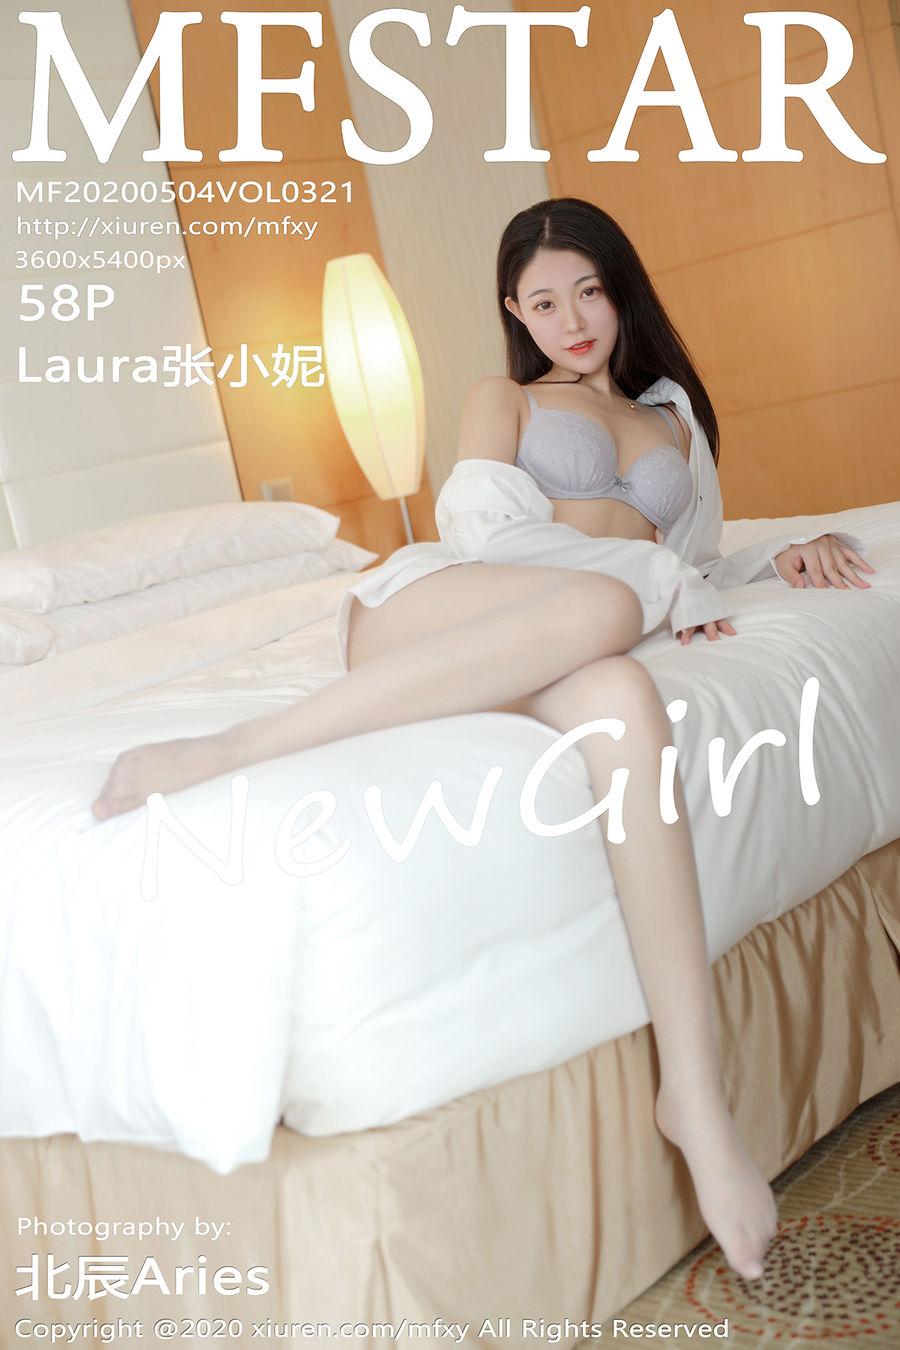 [MFStar模范学院] VOL.321 Laura张小妮 [58+1P/124M]